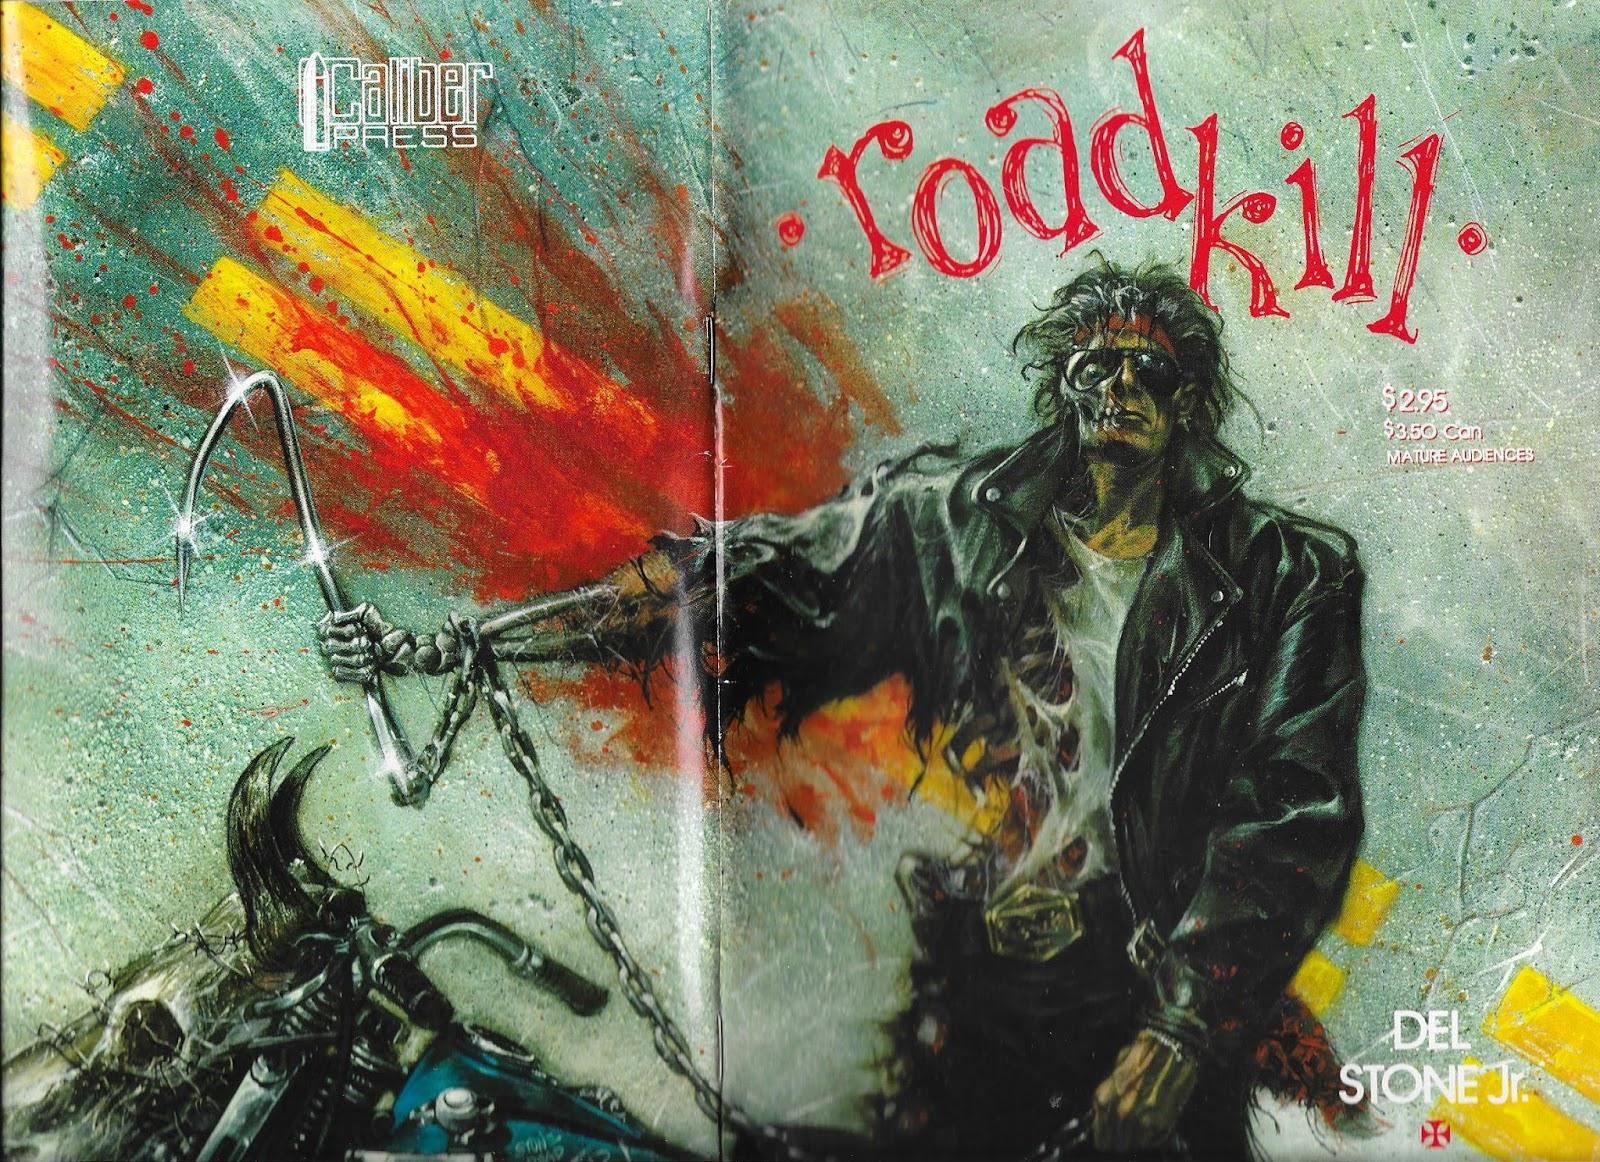 CELTIC PUMPKIN: Roadkill: From the CP Cutting Room Floor